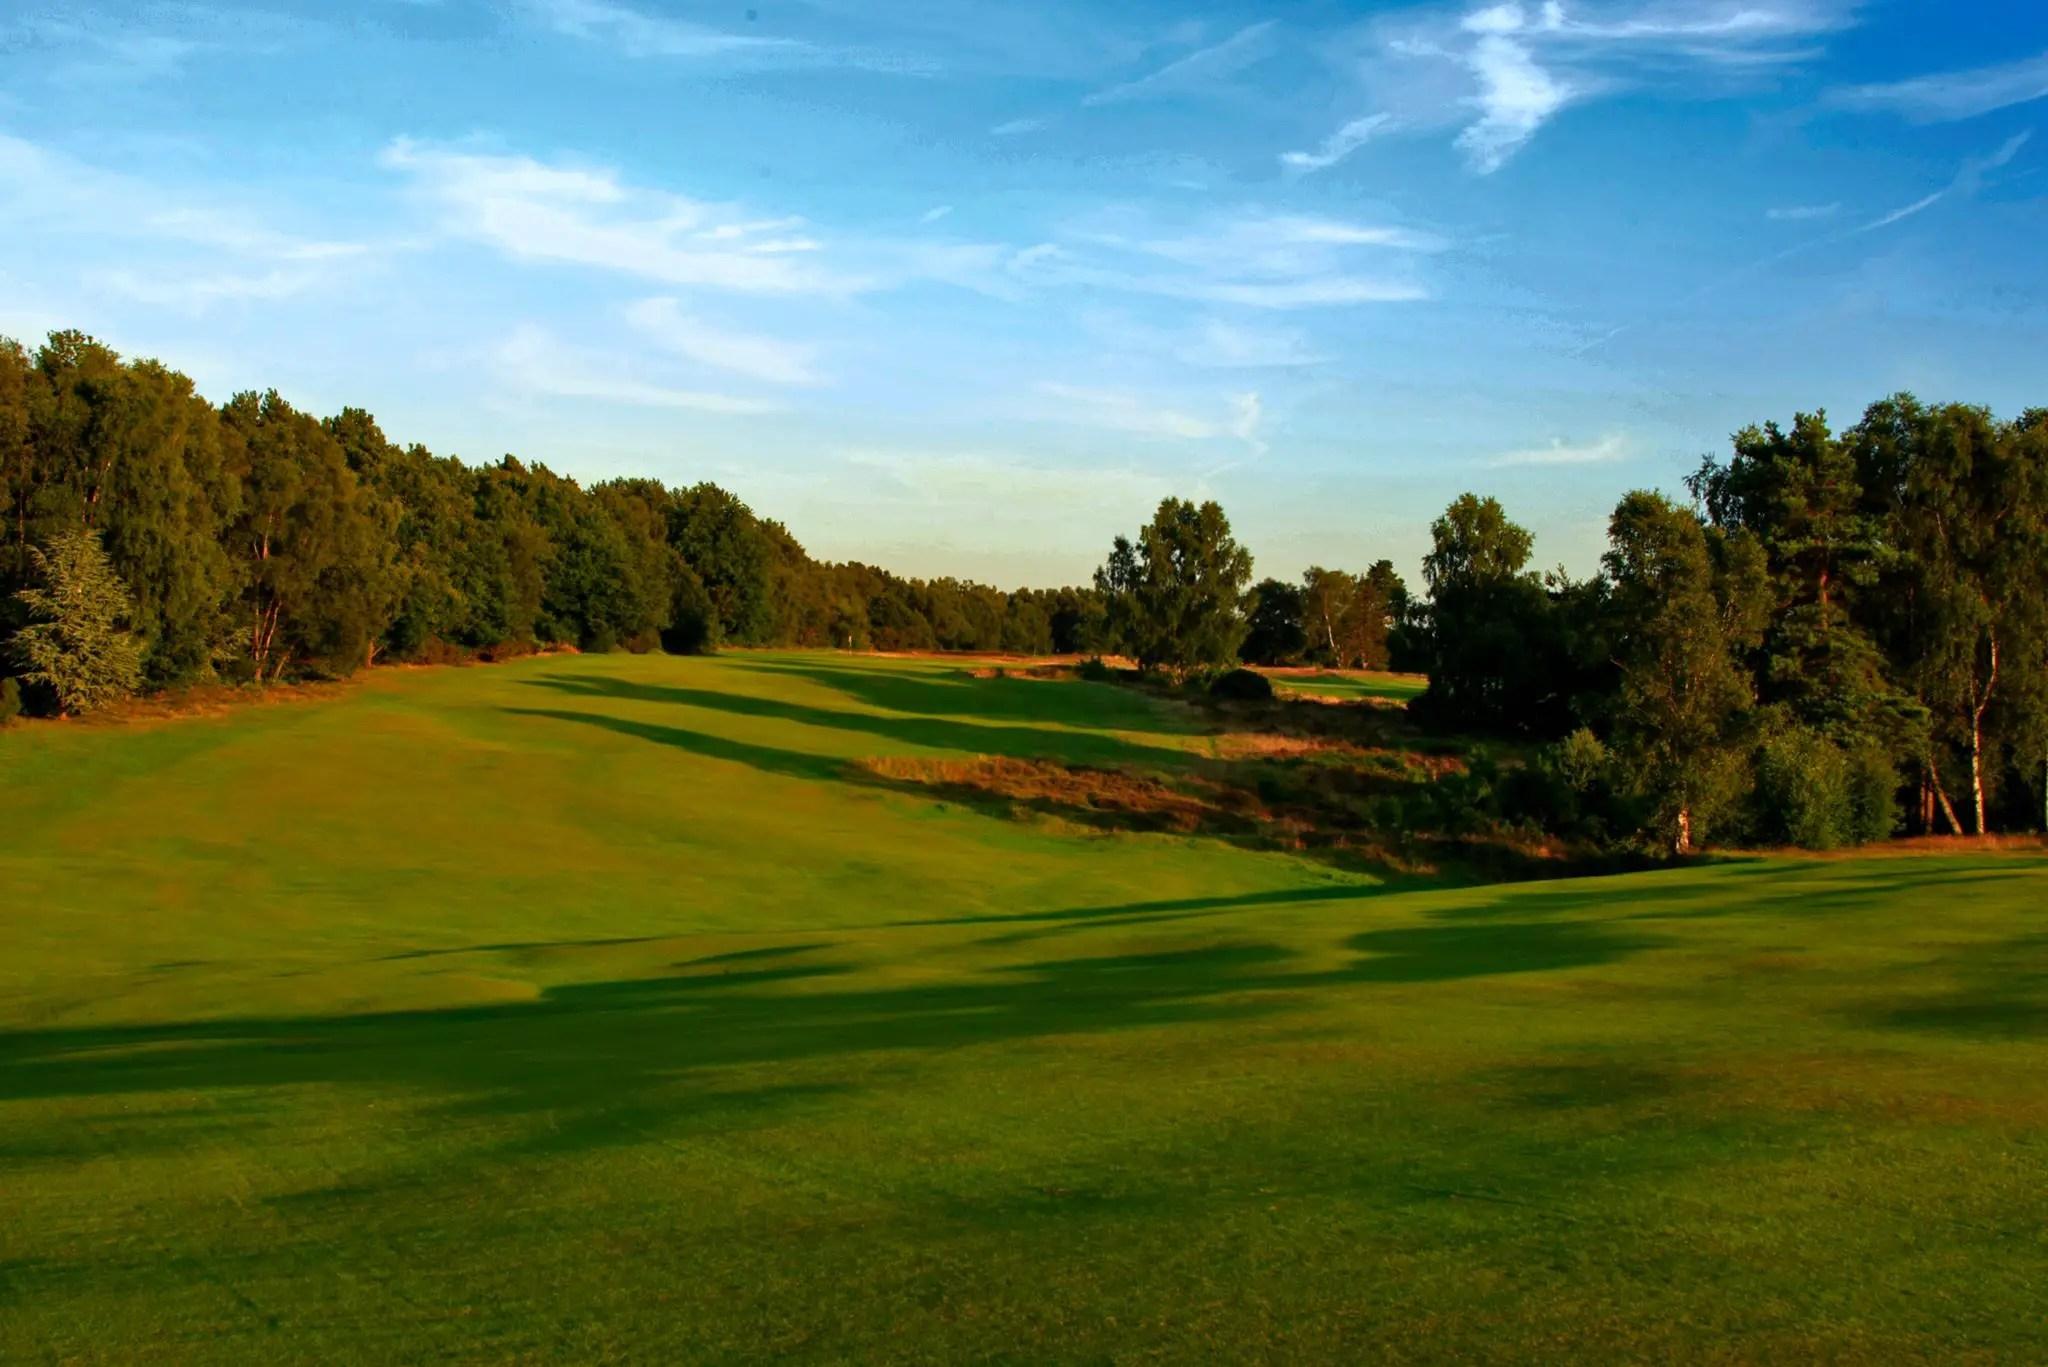 Golfshake.com - Play More. Play Better.